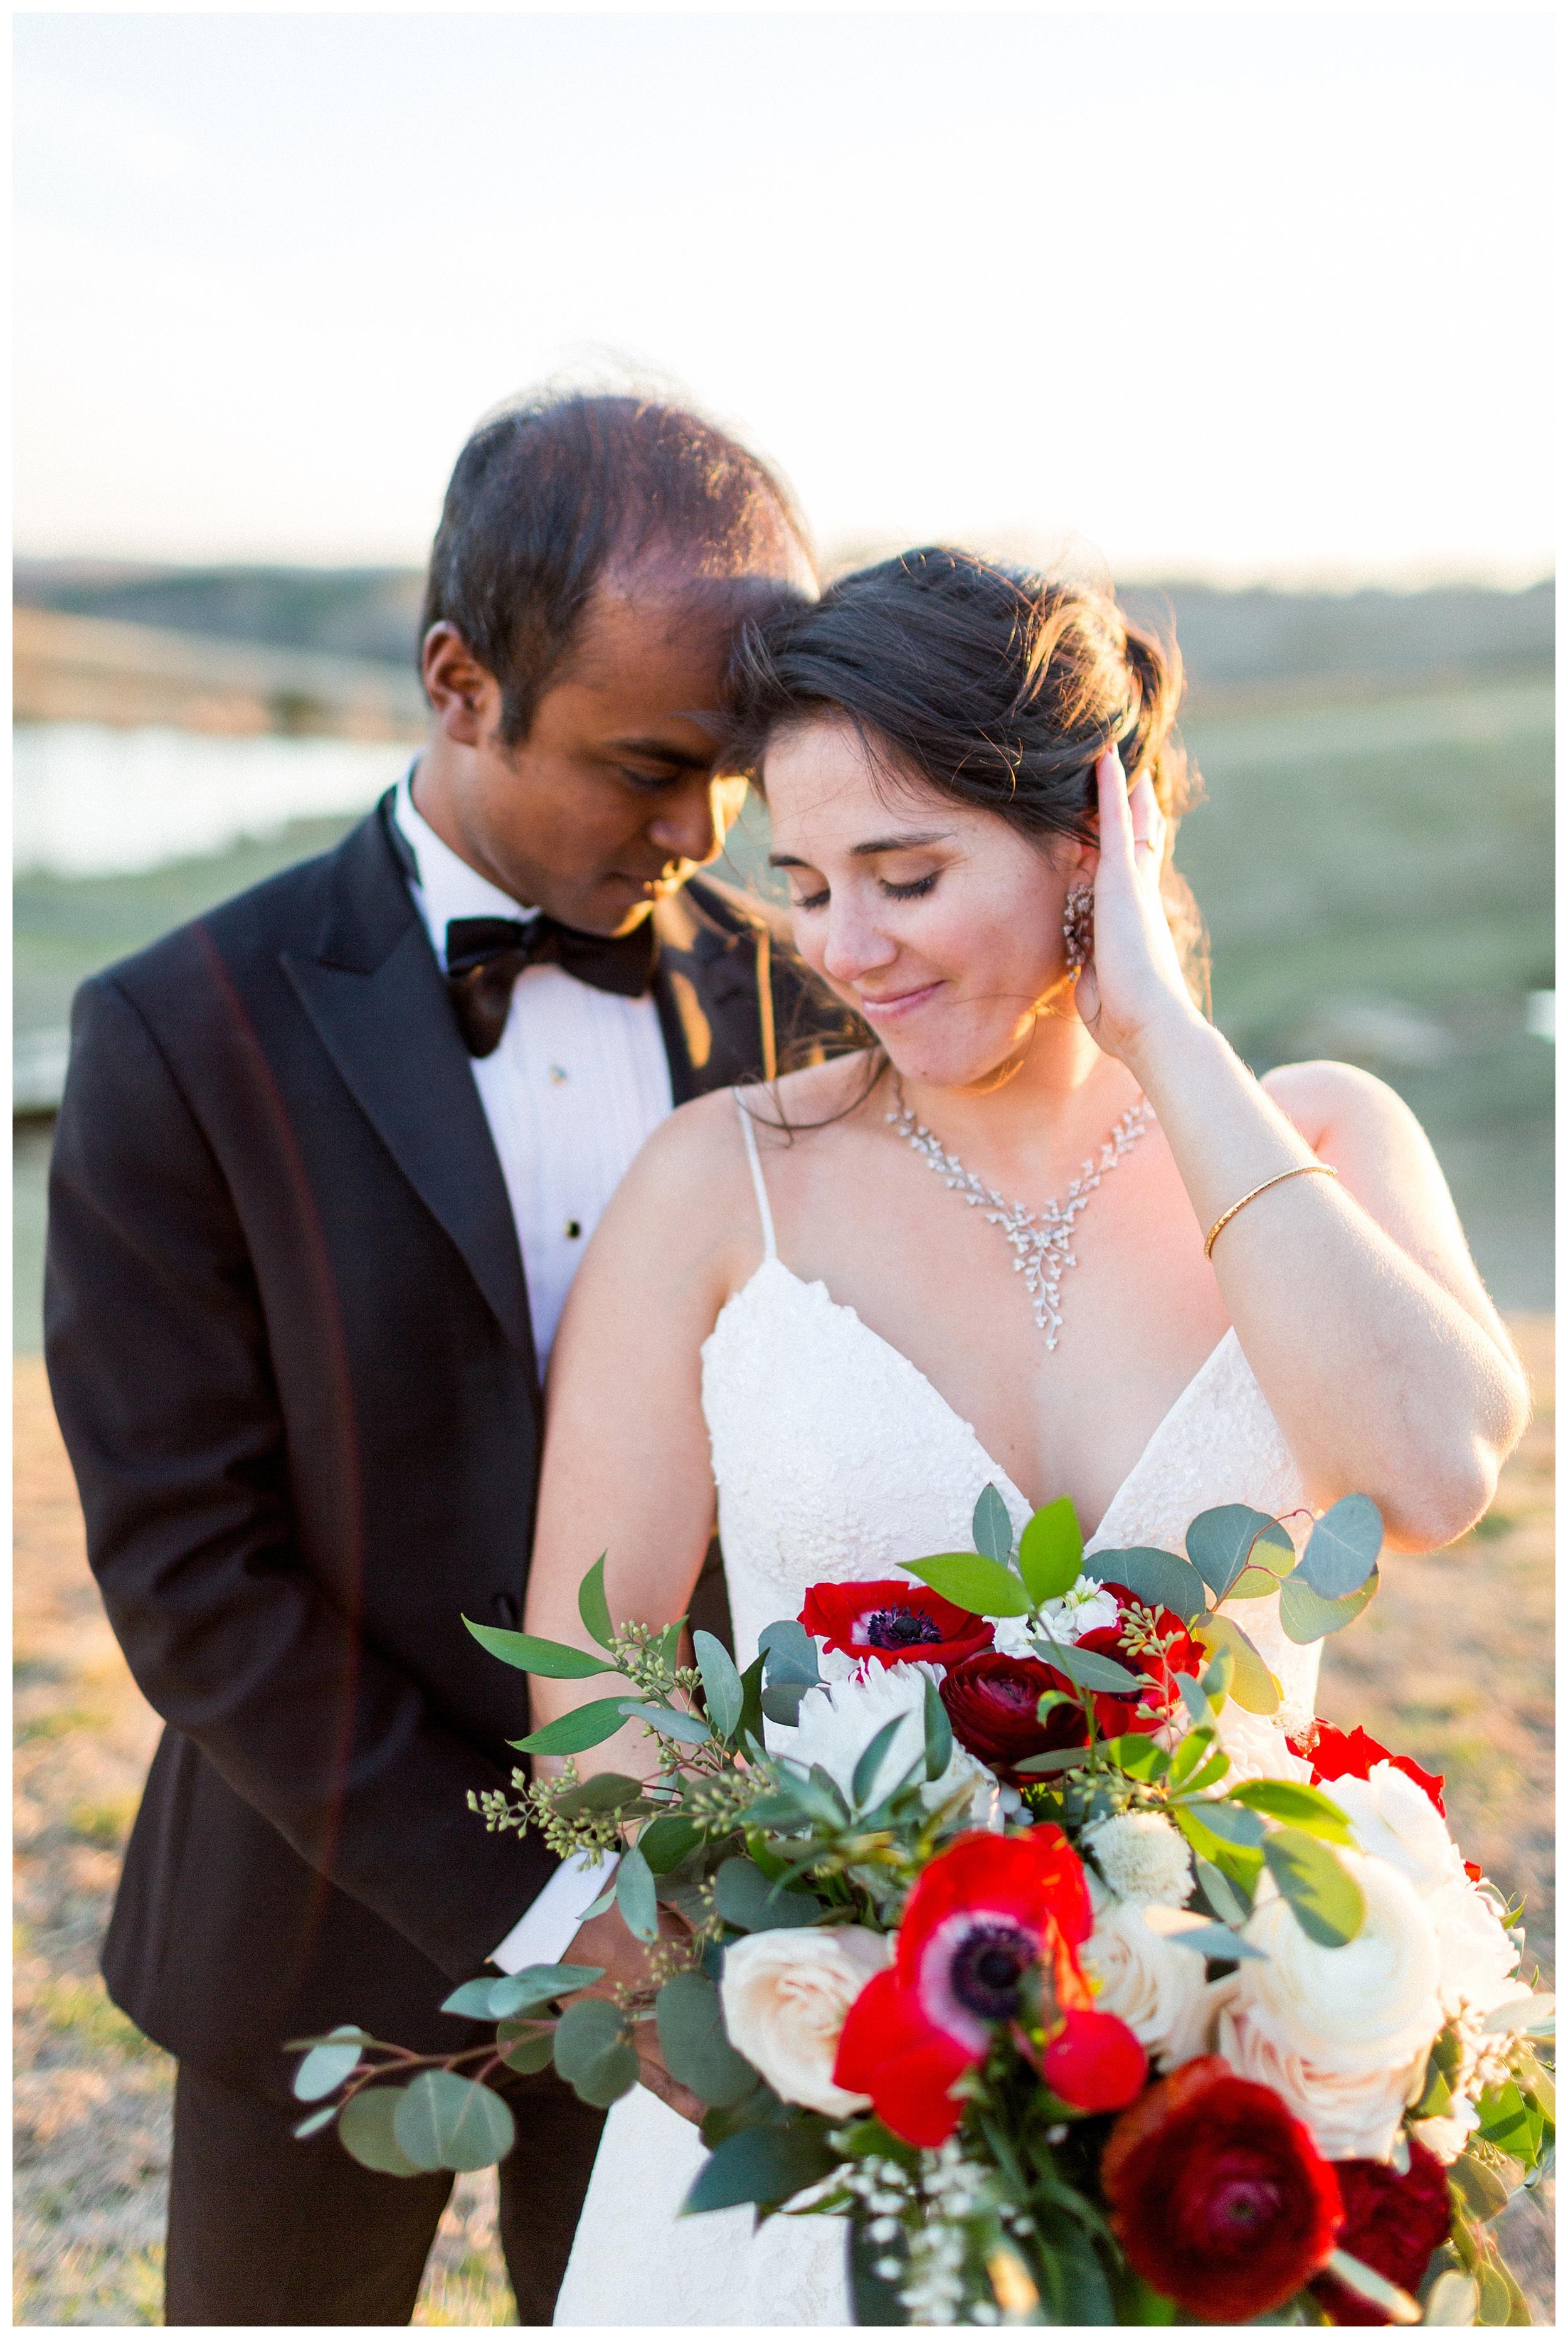 Stone Tower Winery Wedding | Virginia Winter Wedding | VA Wedding Photographer Kir Tuben_0106.jpg